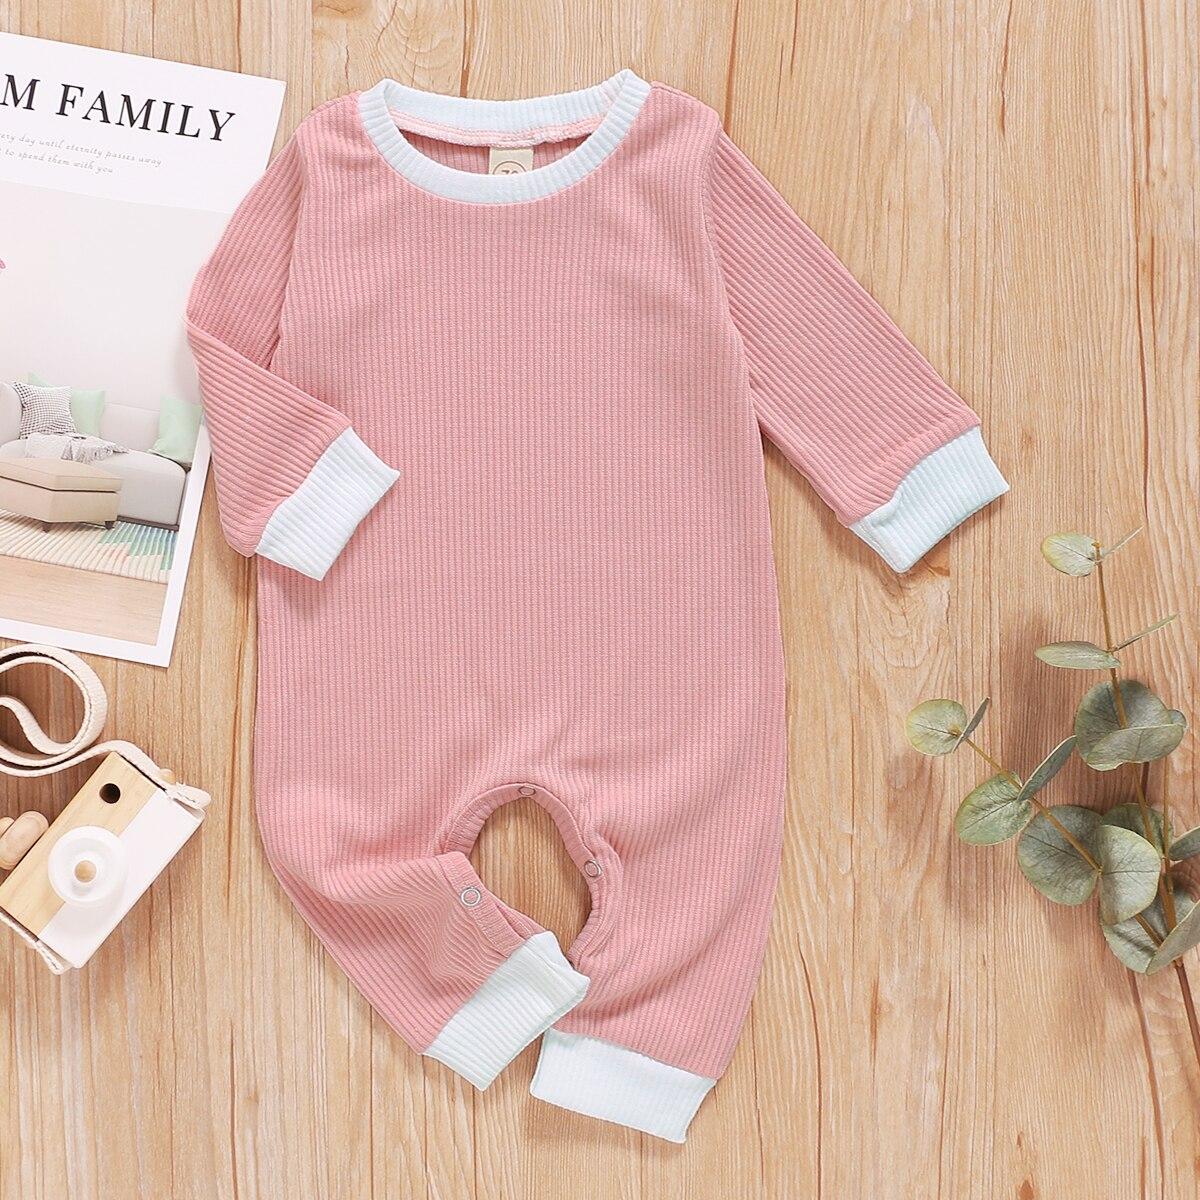 Pelele de bebé recién nacido 2020, ropa de Otoño Invierno, pelele informal liso a rayas de manga larga para bebé, mono, ropa para bebé